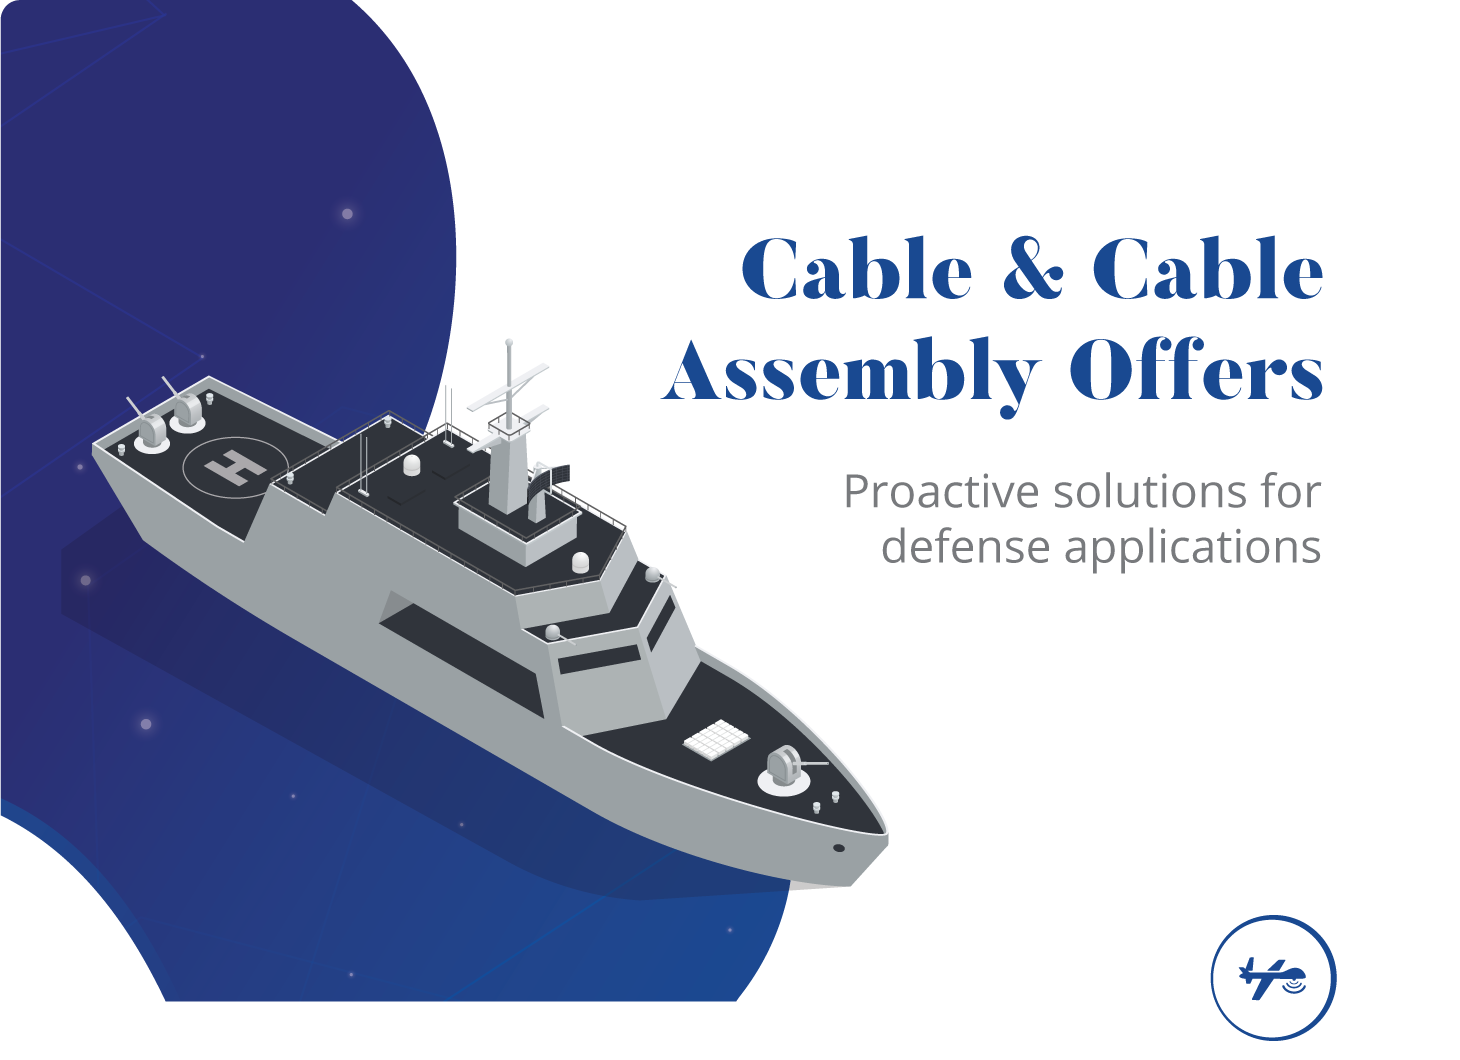 Cables & Cable Assemblies